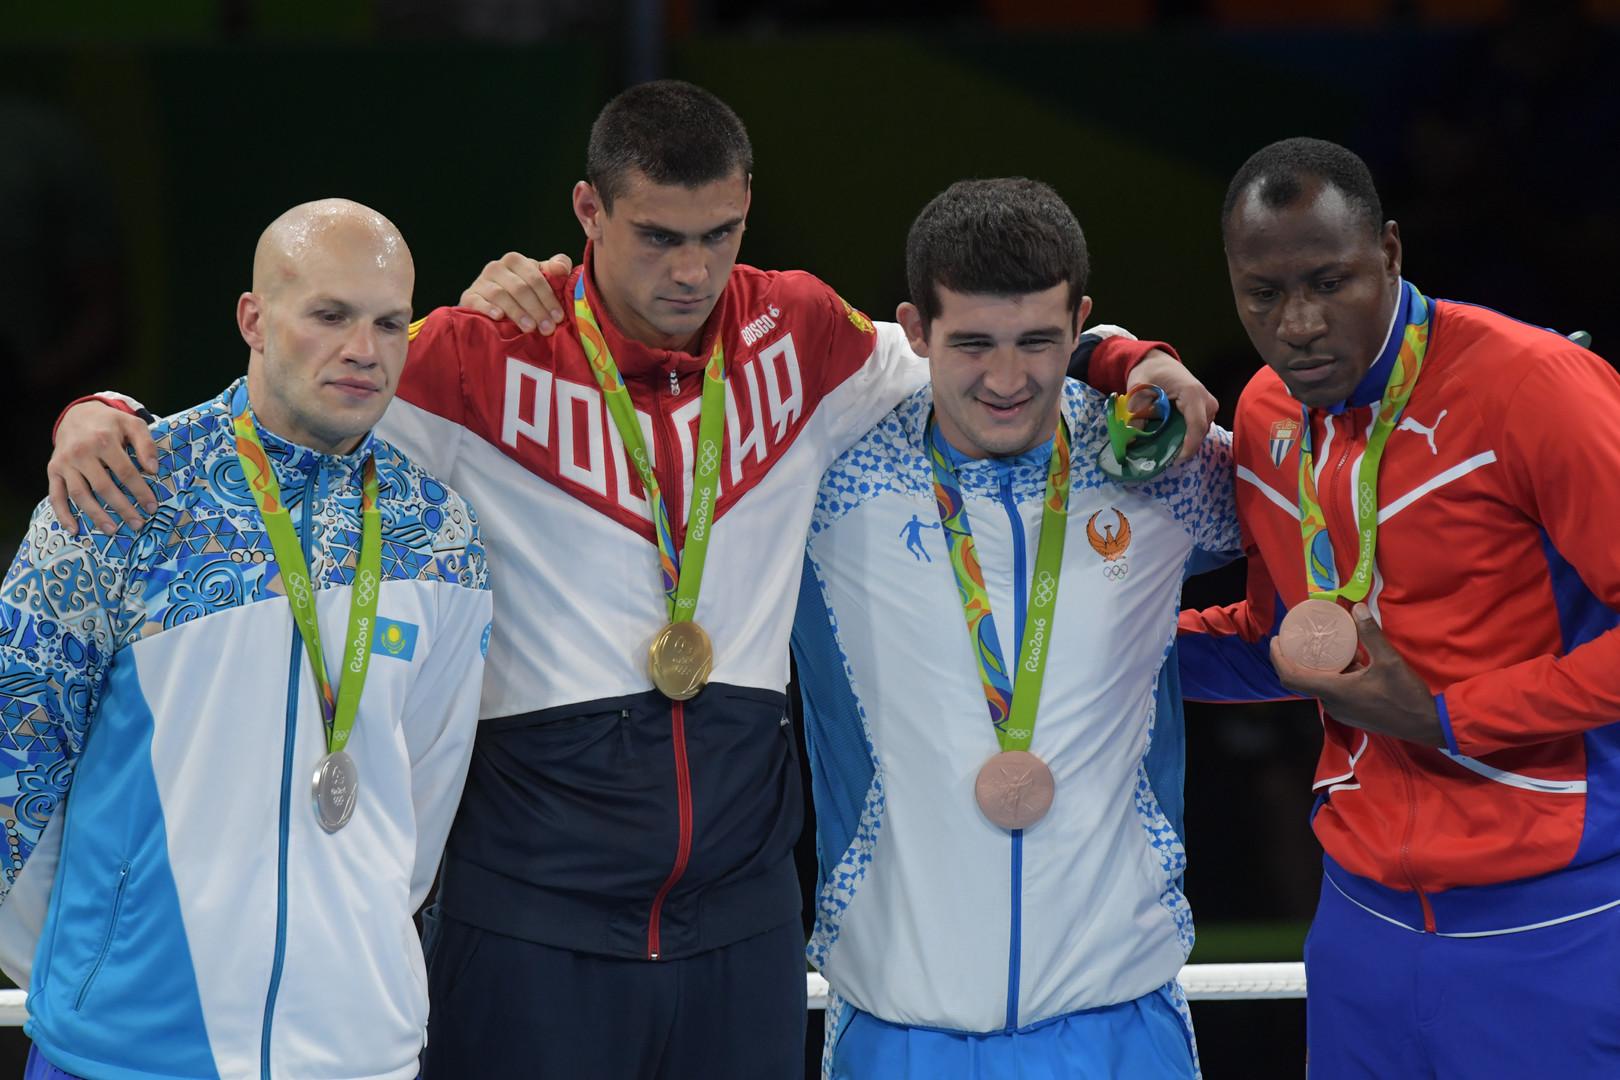 Российский боксёр Евгений Тищенко завоевал золото Олимпиады